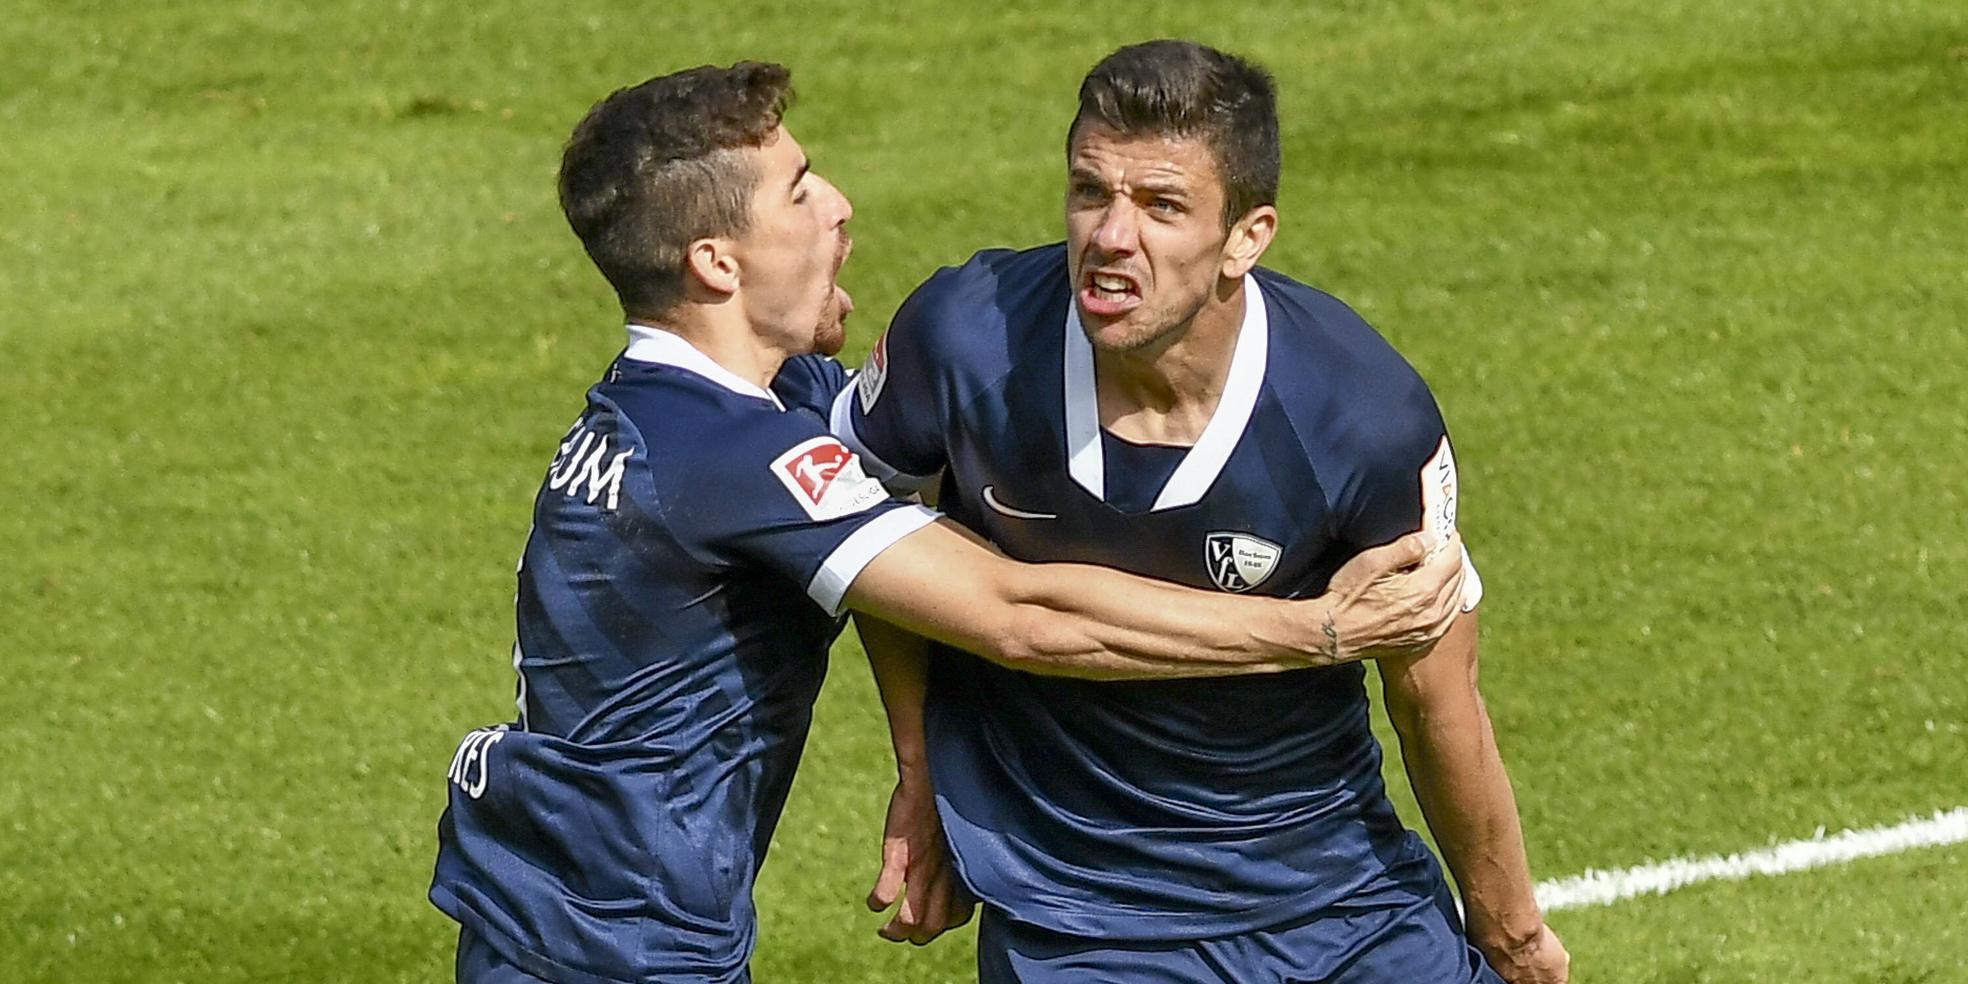 Danilo Soares und Anthony Losilla vom VfL Bochum